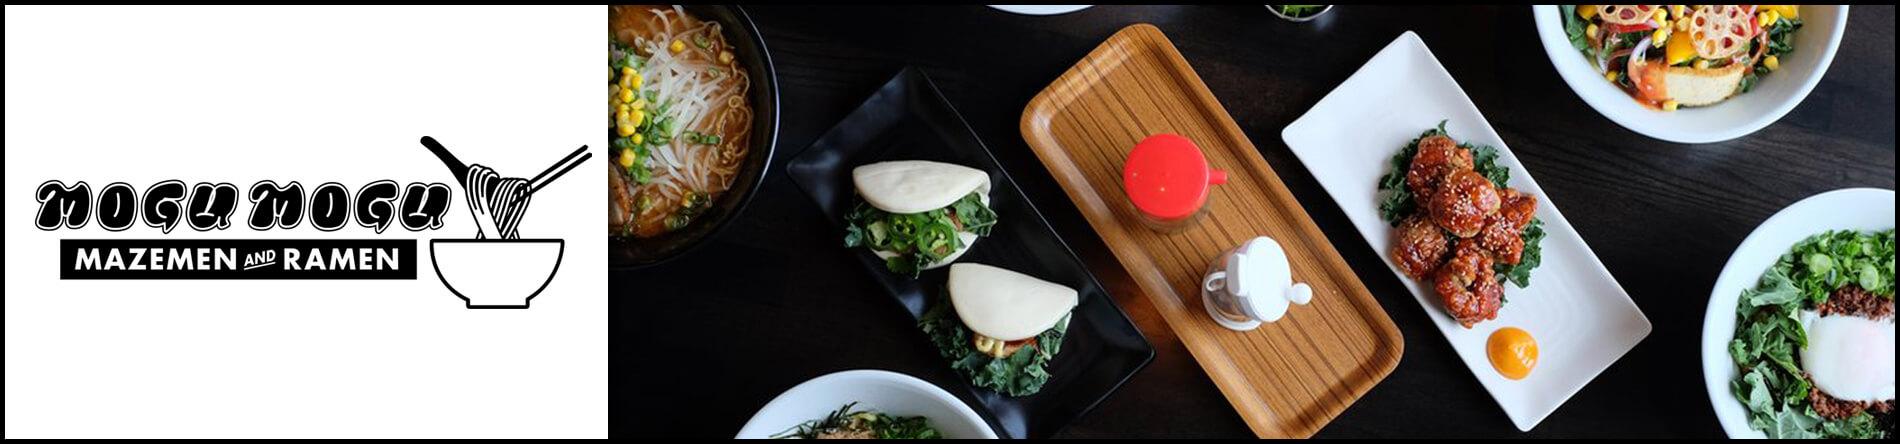 Mogumogu is a Japanese Restaurant in Los Angeles, CA